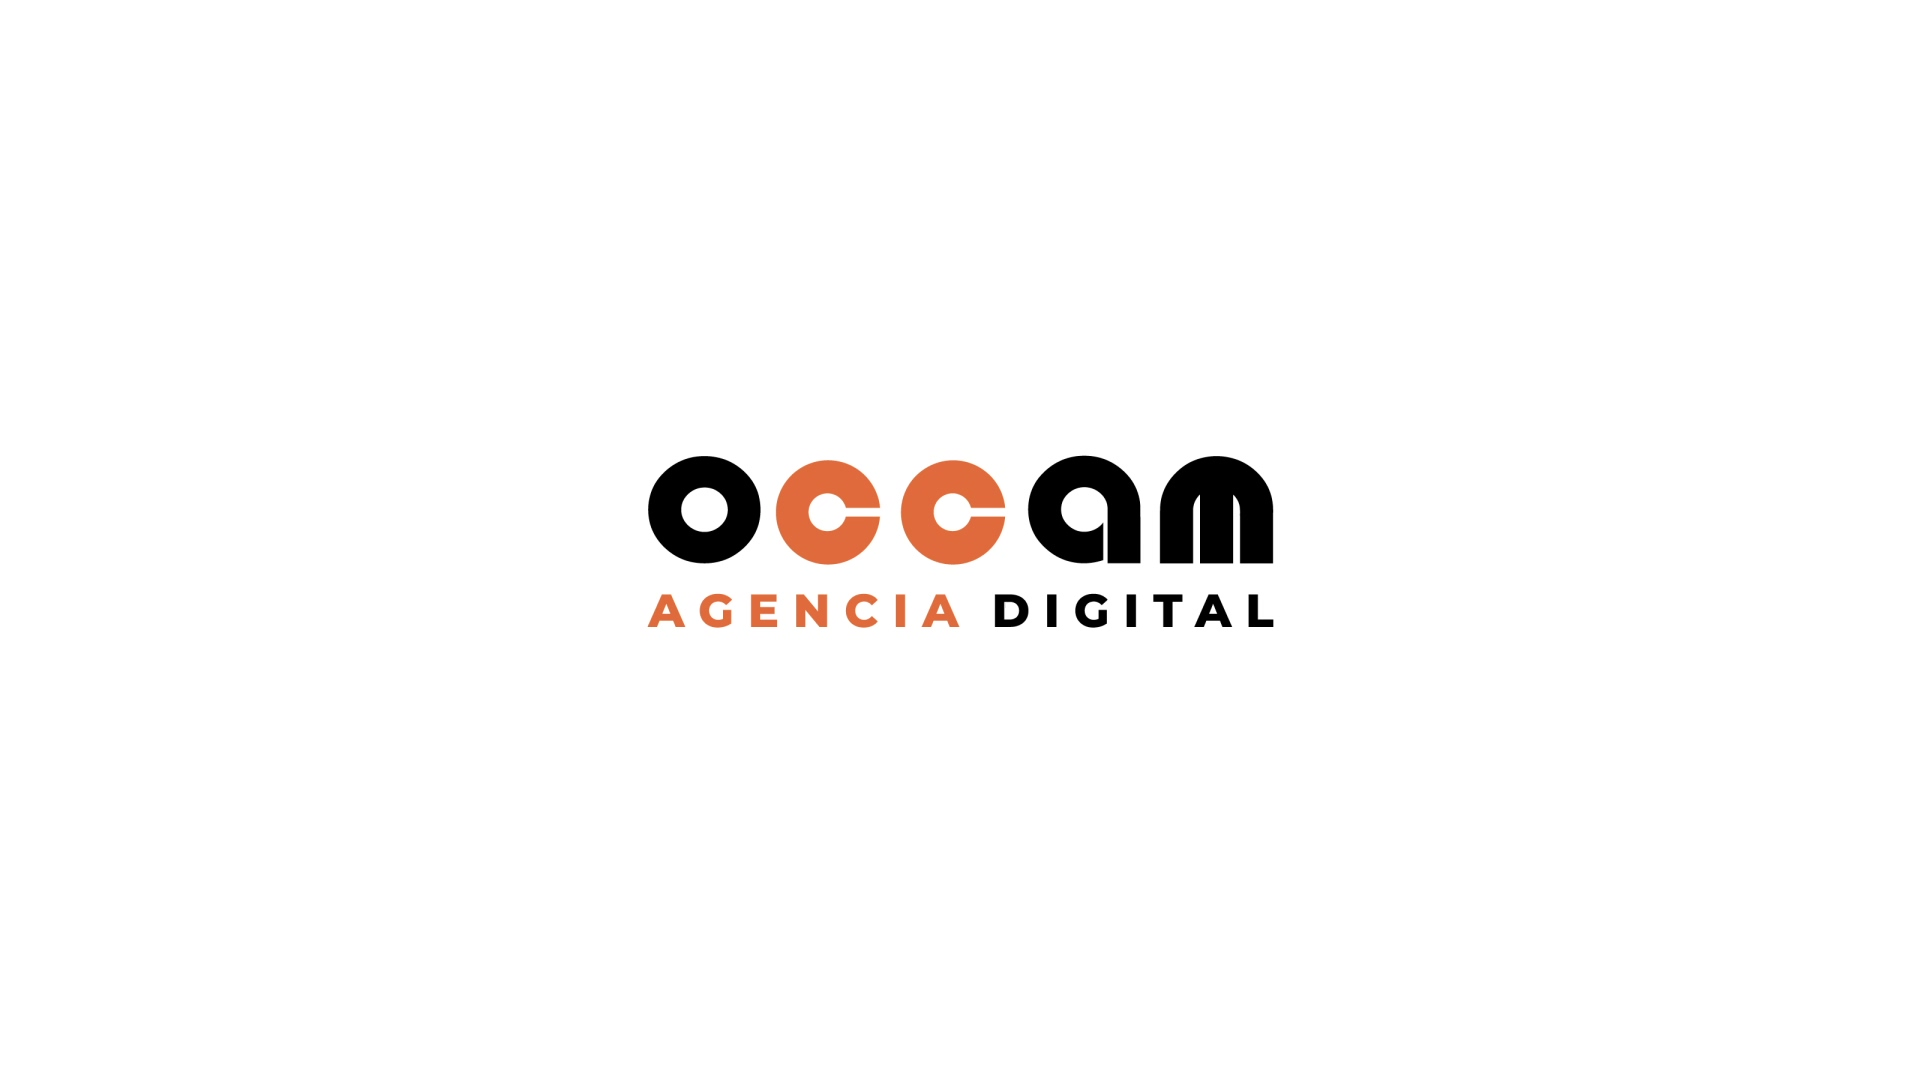 Servicios audiosivisuales-Webseries Corporativas